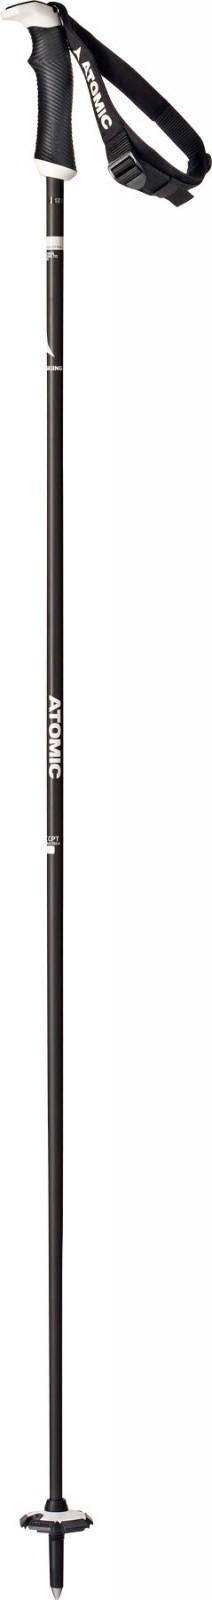 Atomic AMT Carbon SQS - čierna / biela